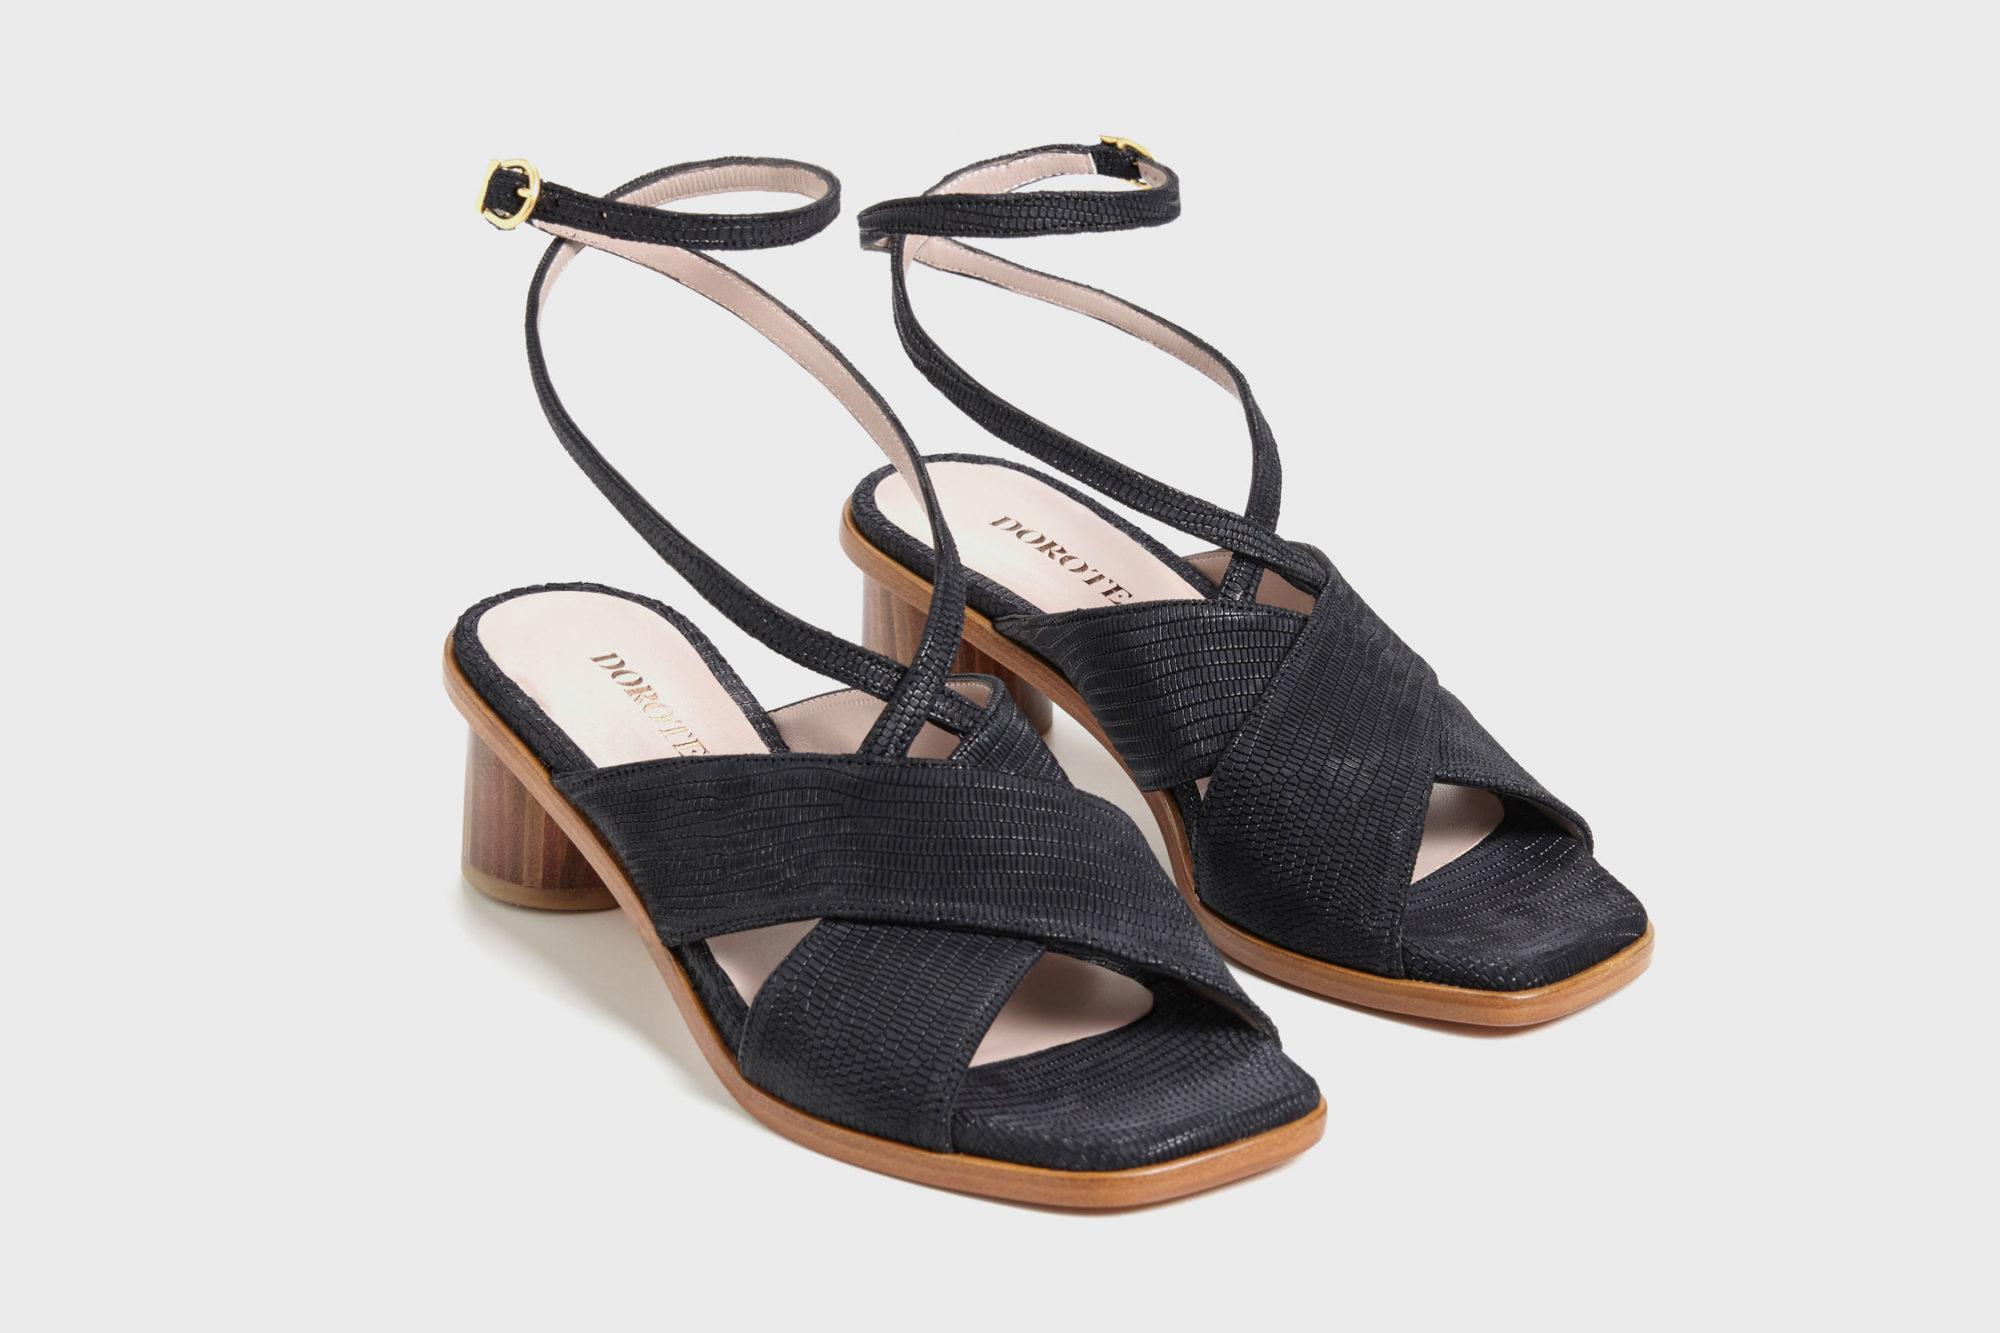 Dorotea sandalia de tacón medio Daphne negra ss17 par